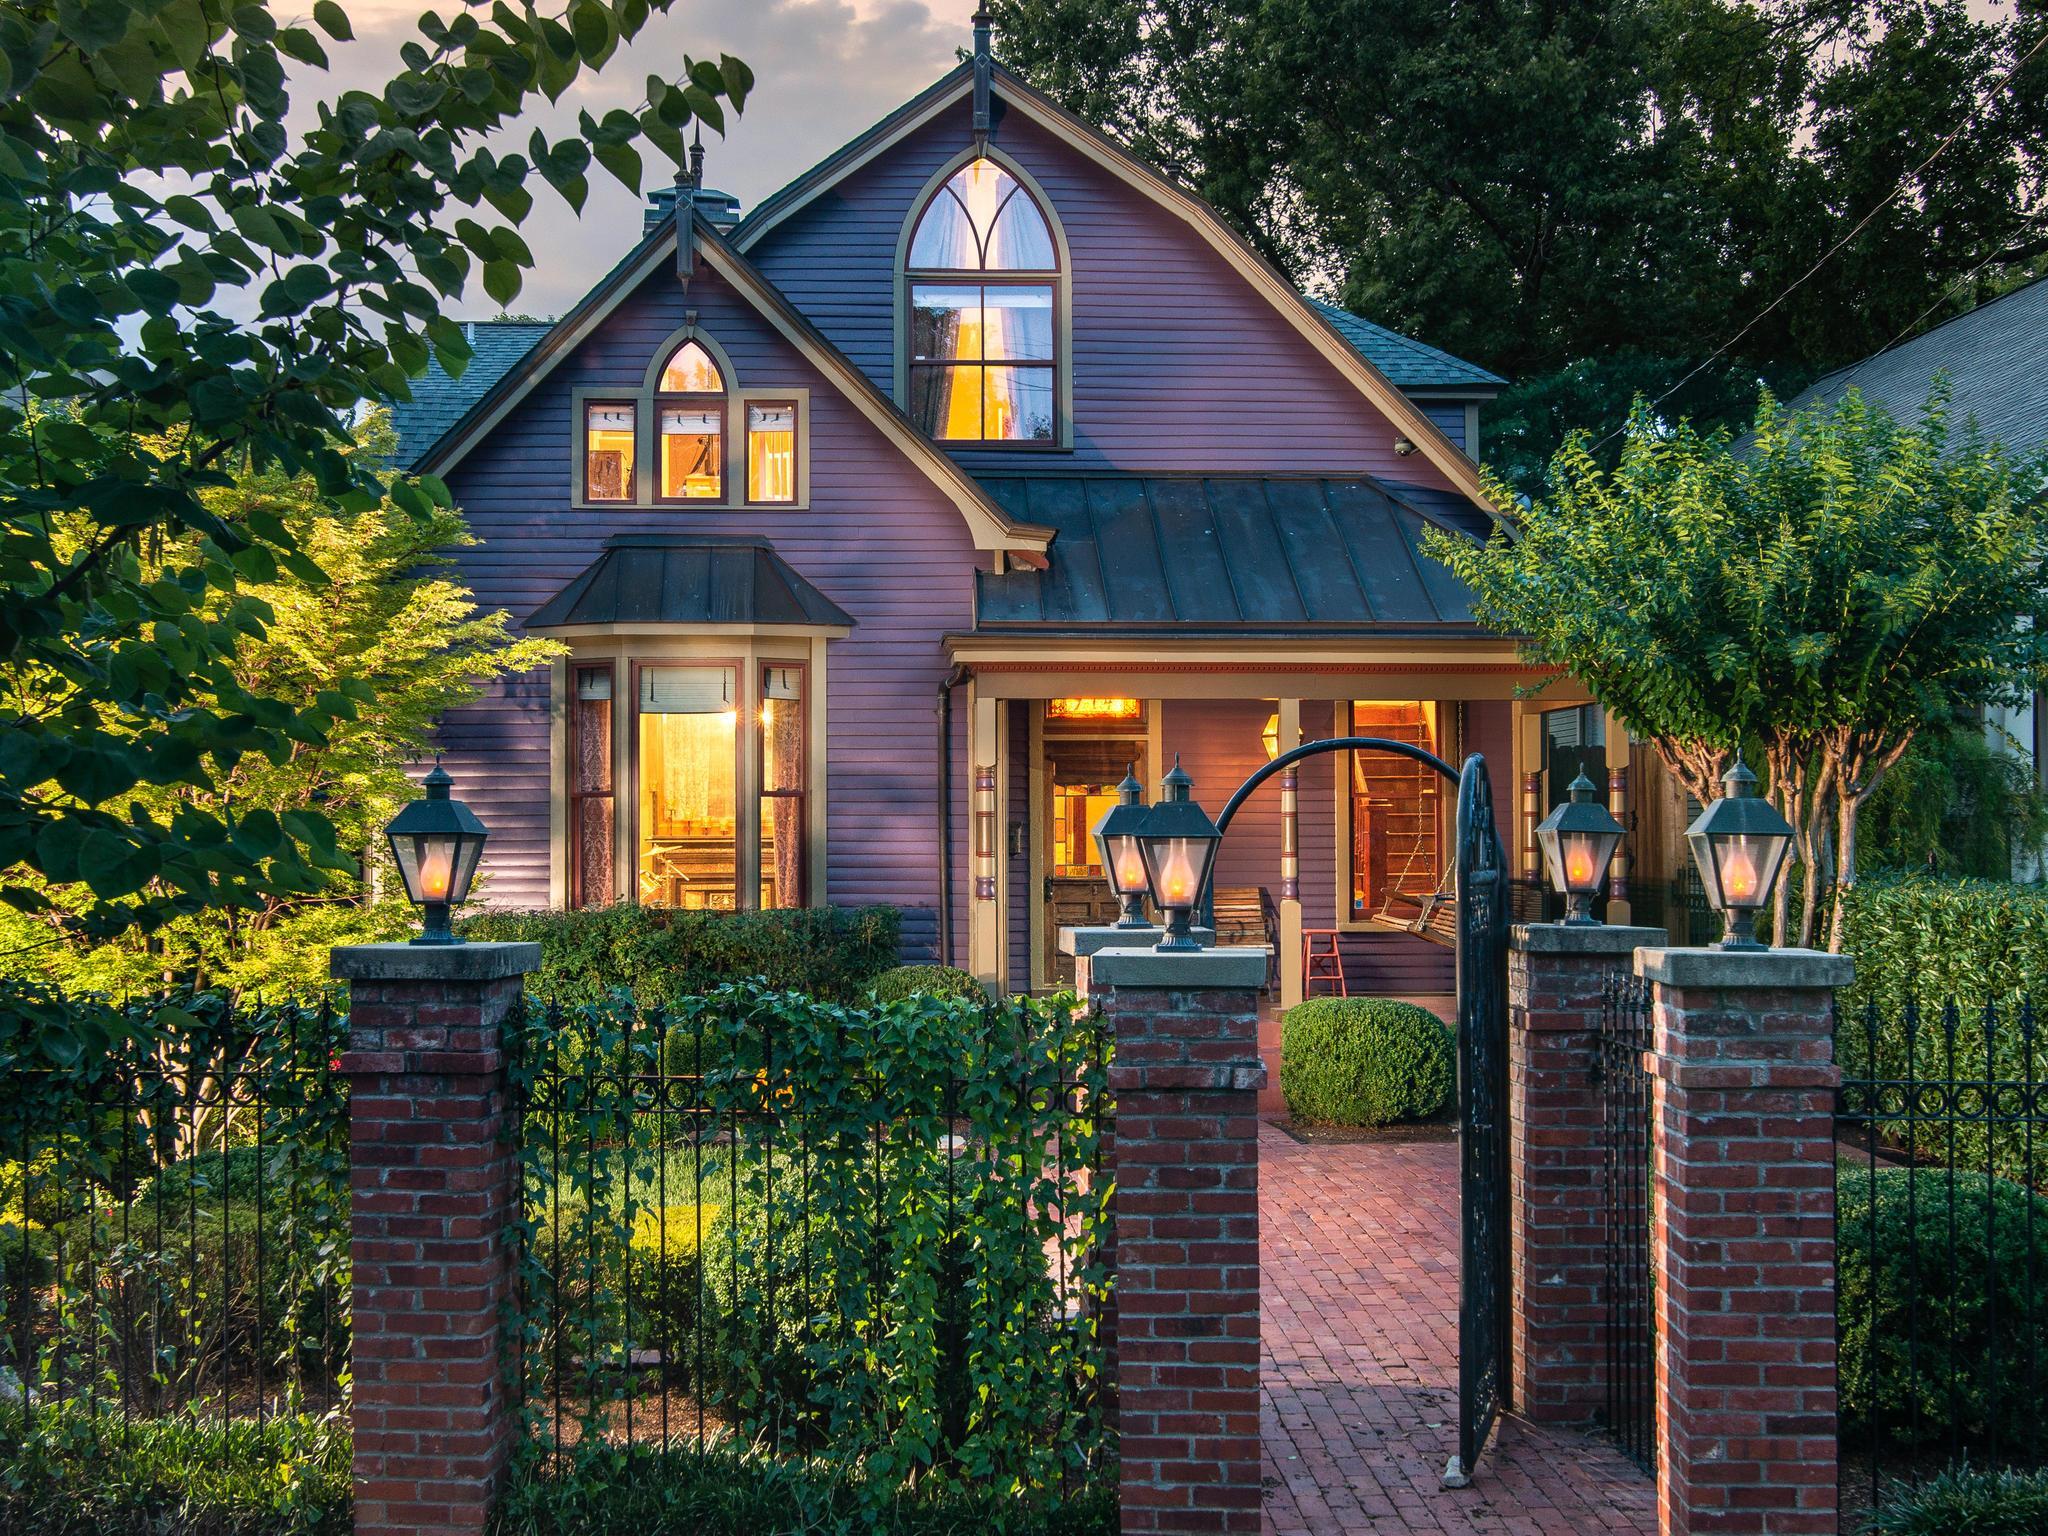 914 S Douglas Ave, Nashville, TN 37204 - Nashville, TN real estate listing